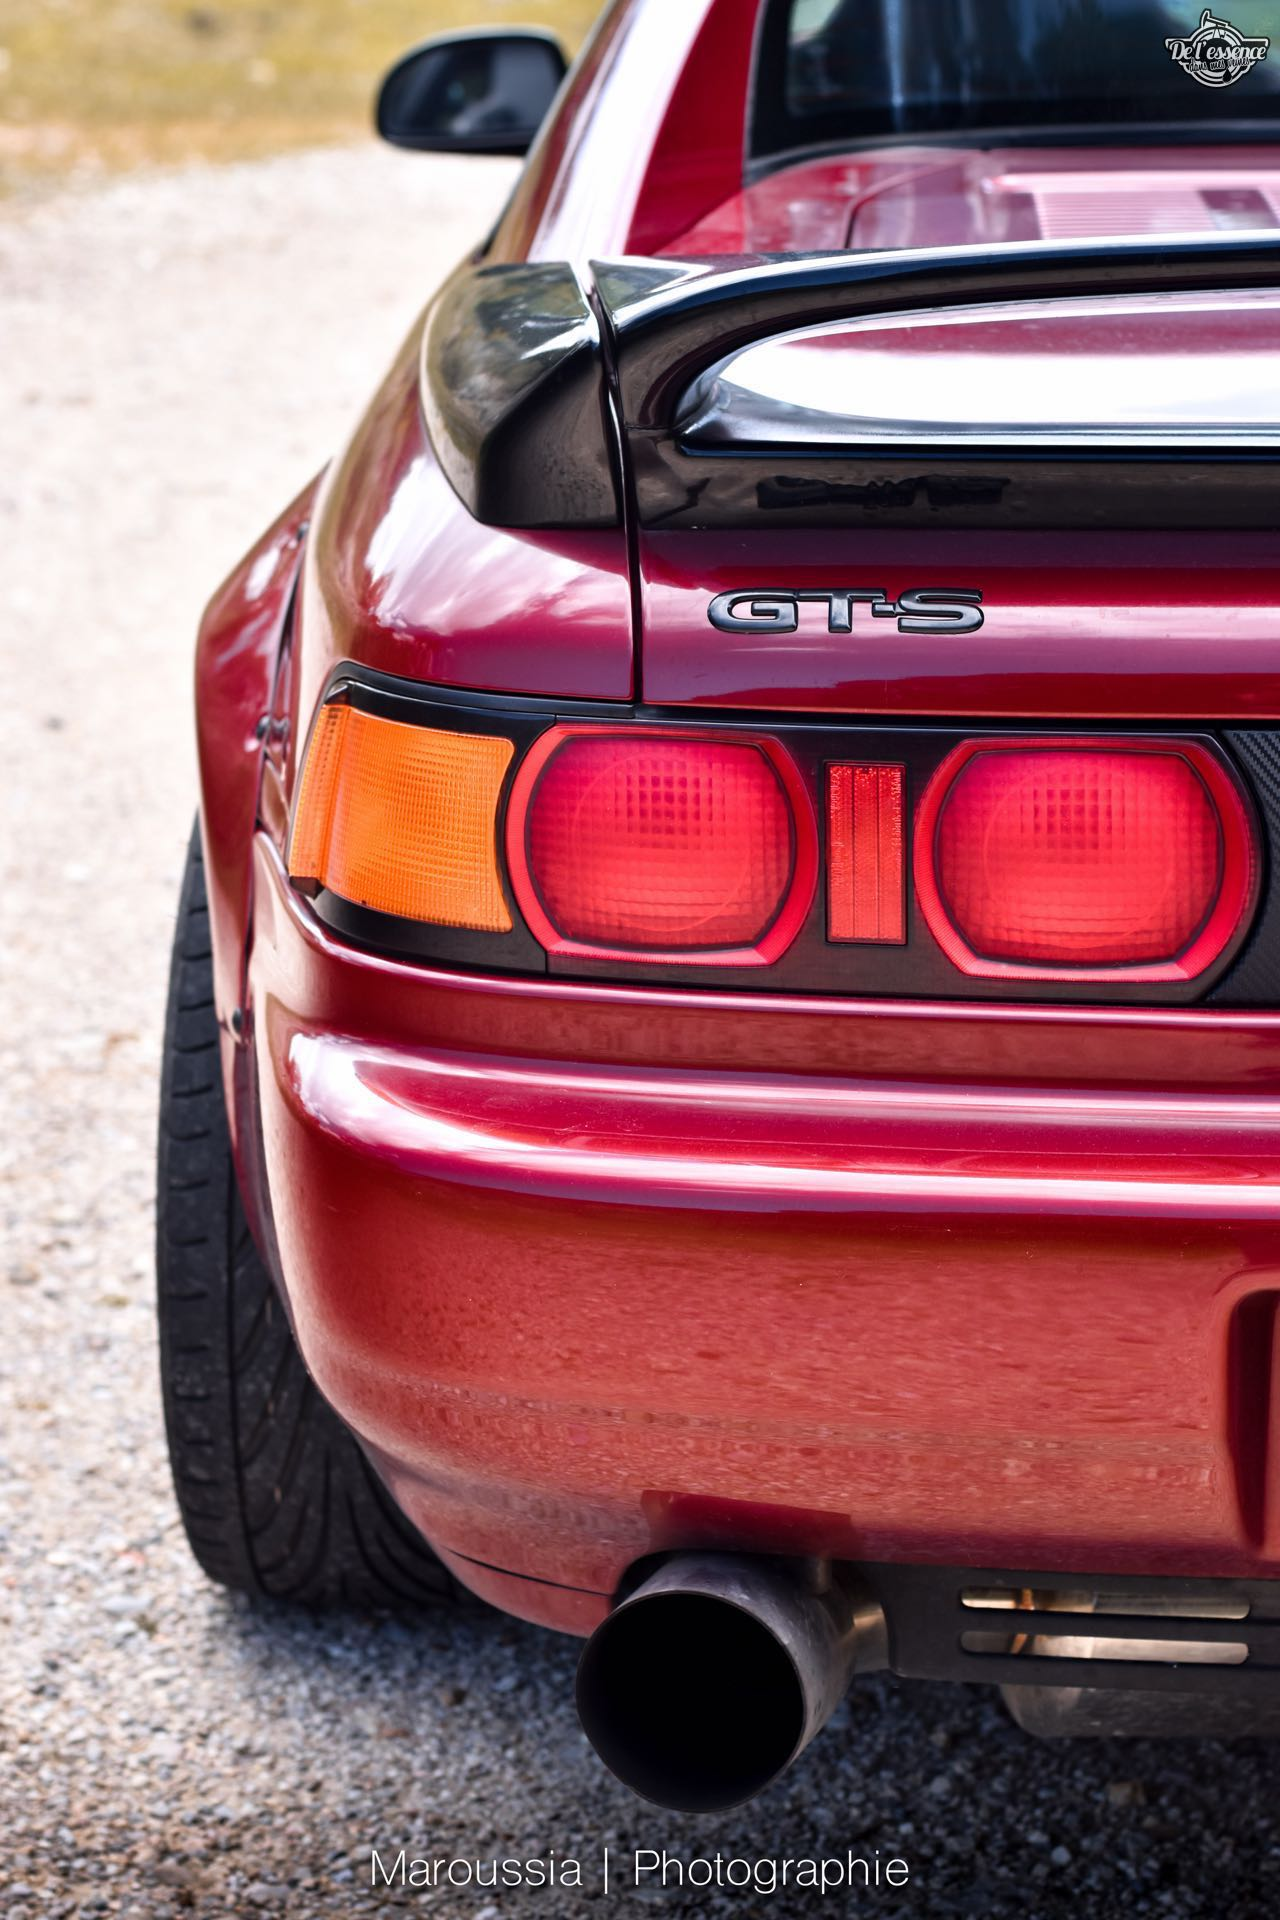 '91 Tay's Toyota MR2 - D'atmo à Turbo... 56